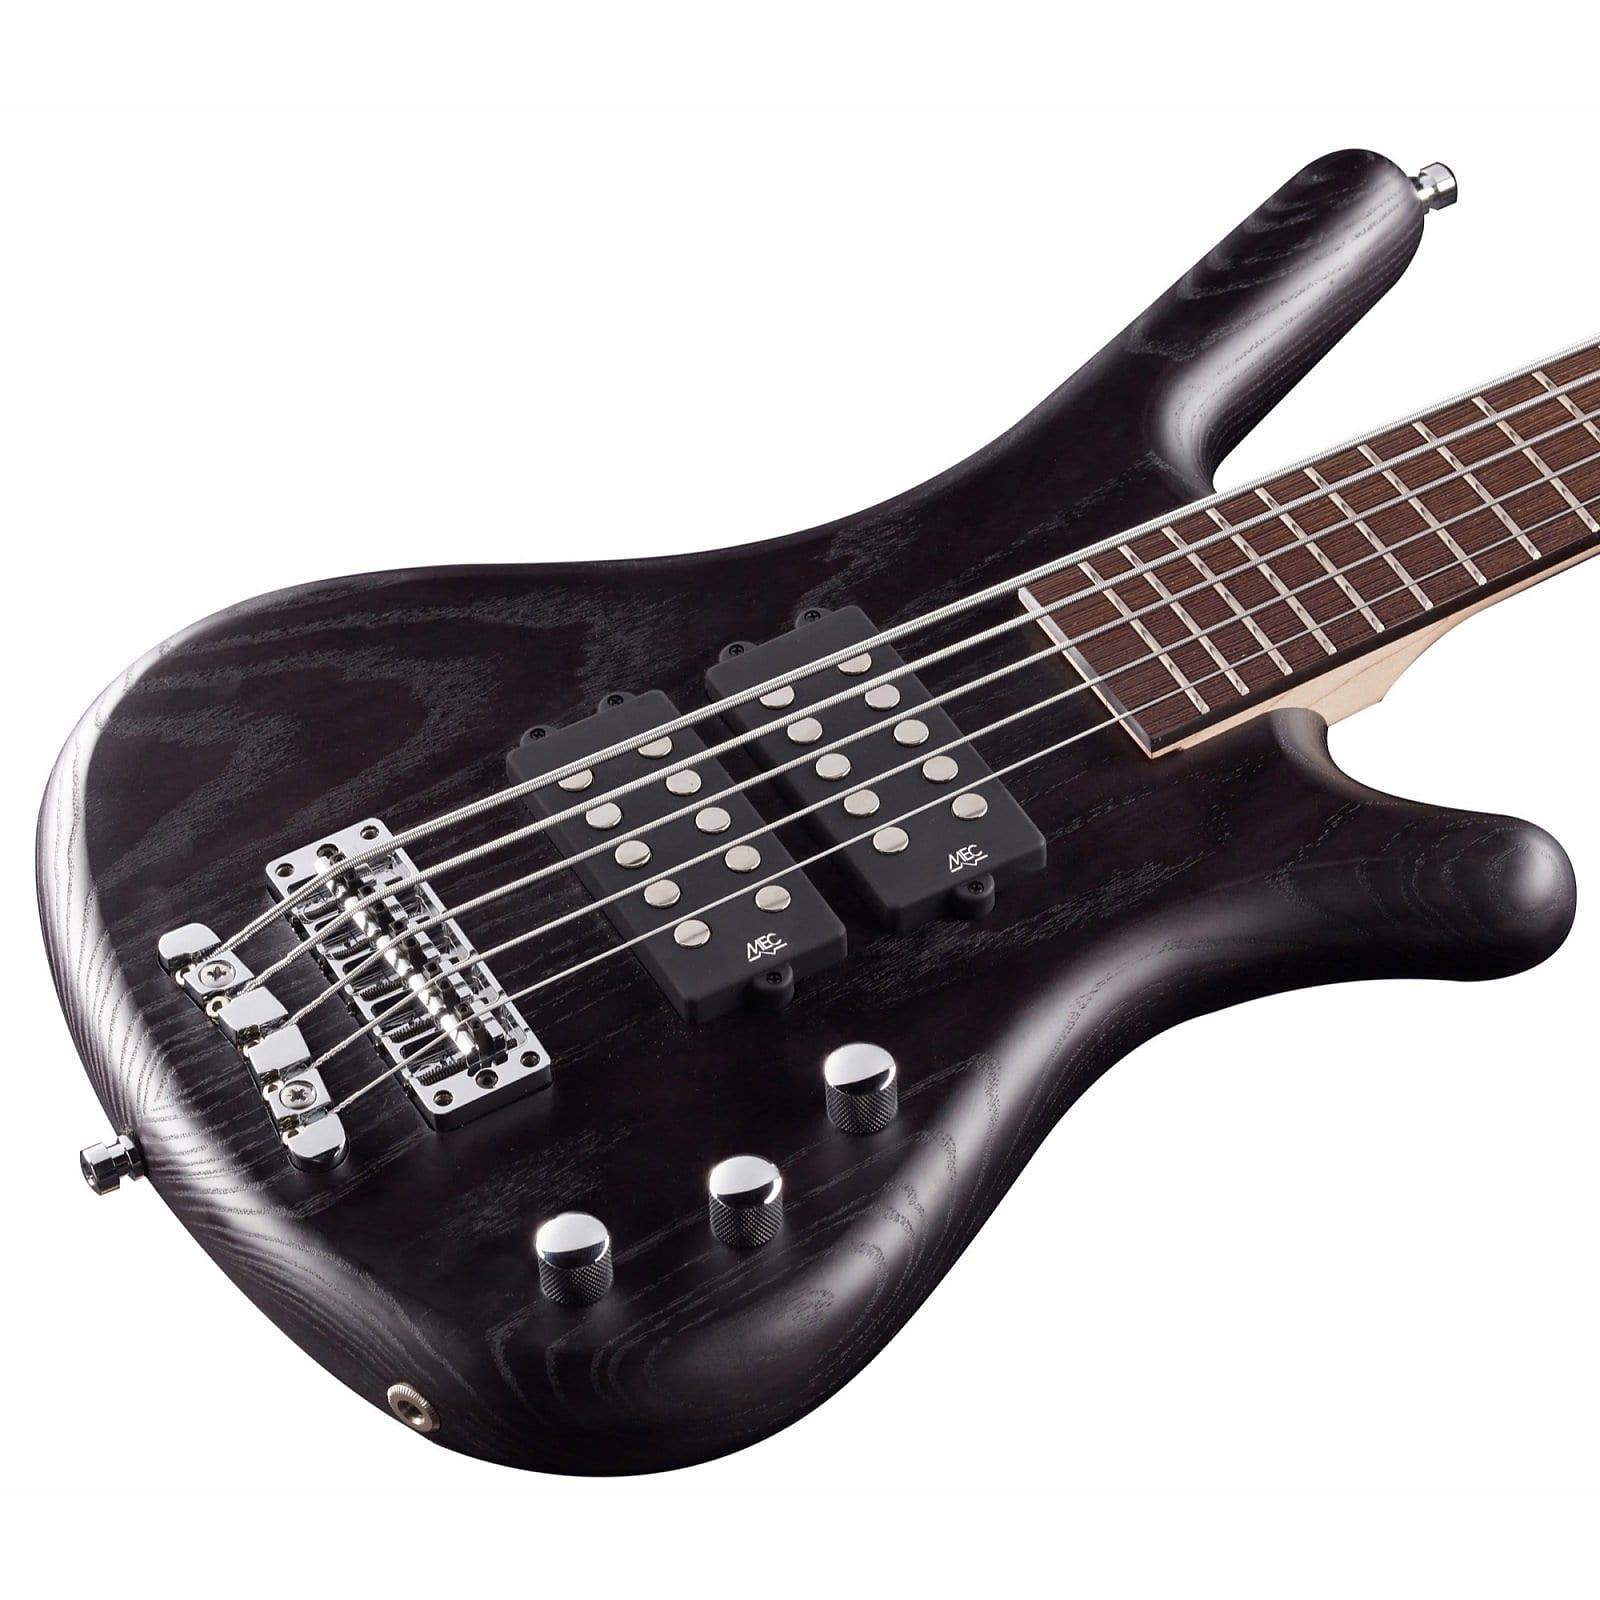 Warwick RockBass Corvette $ 5-String Electric Bass - Nirvana Black Transparent Satin